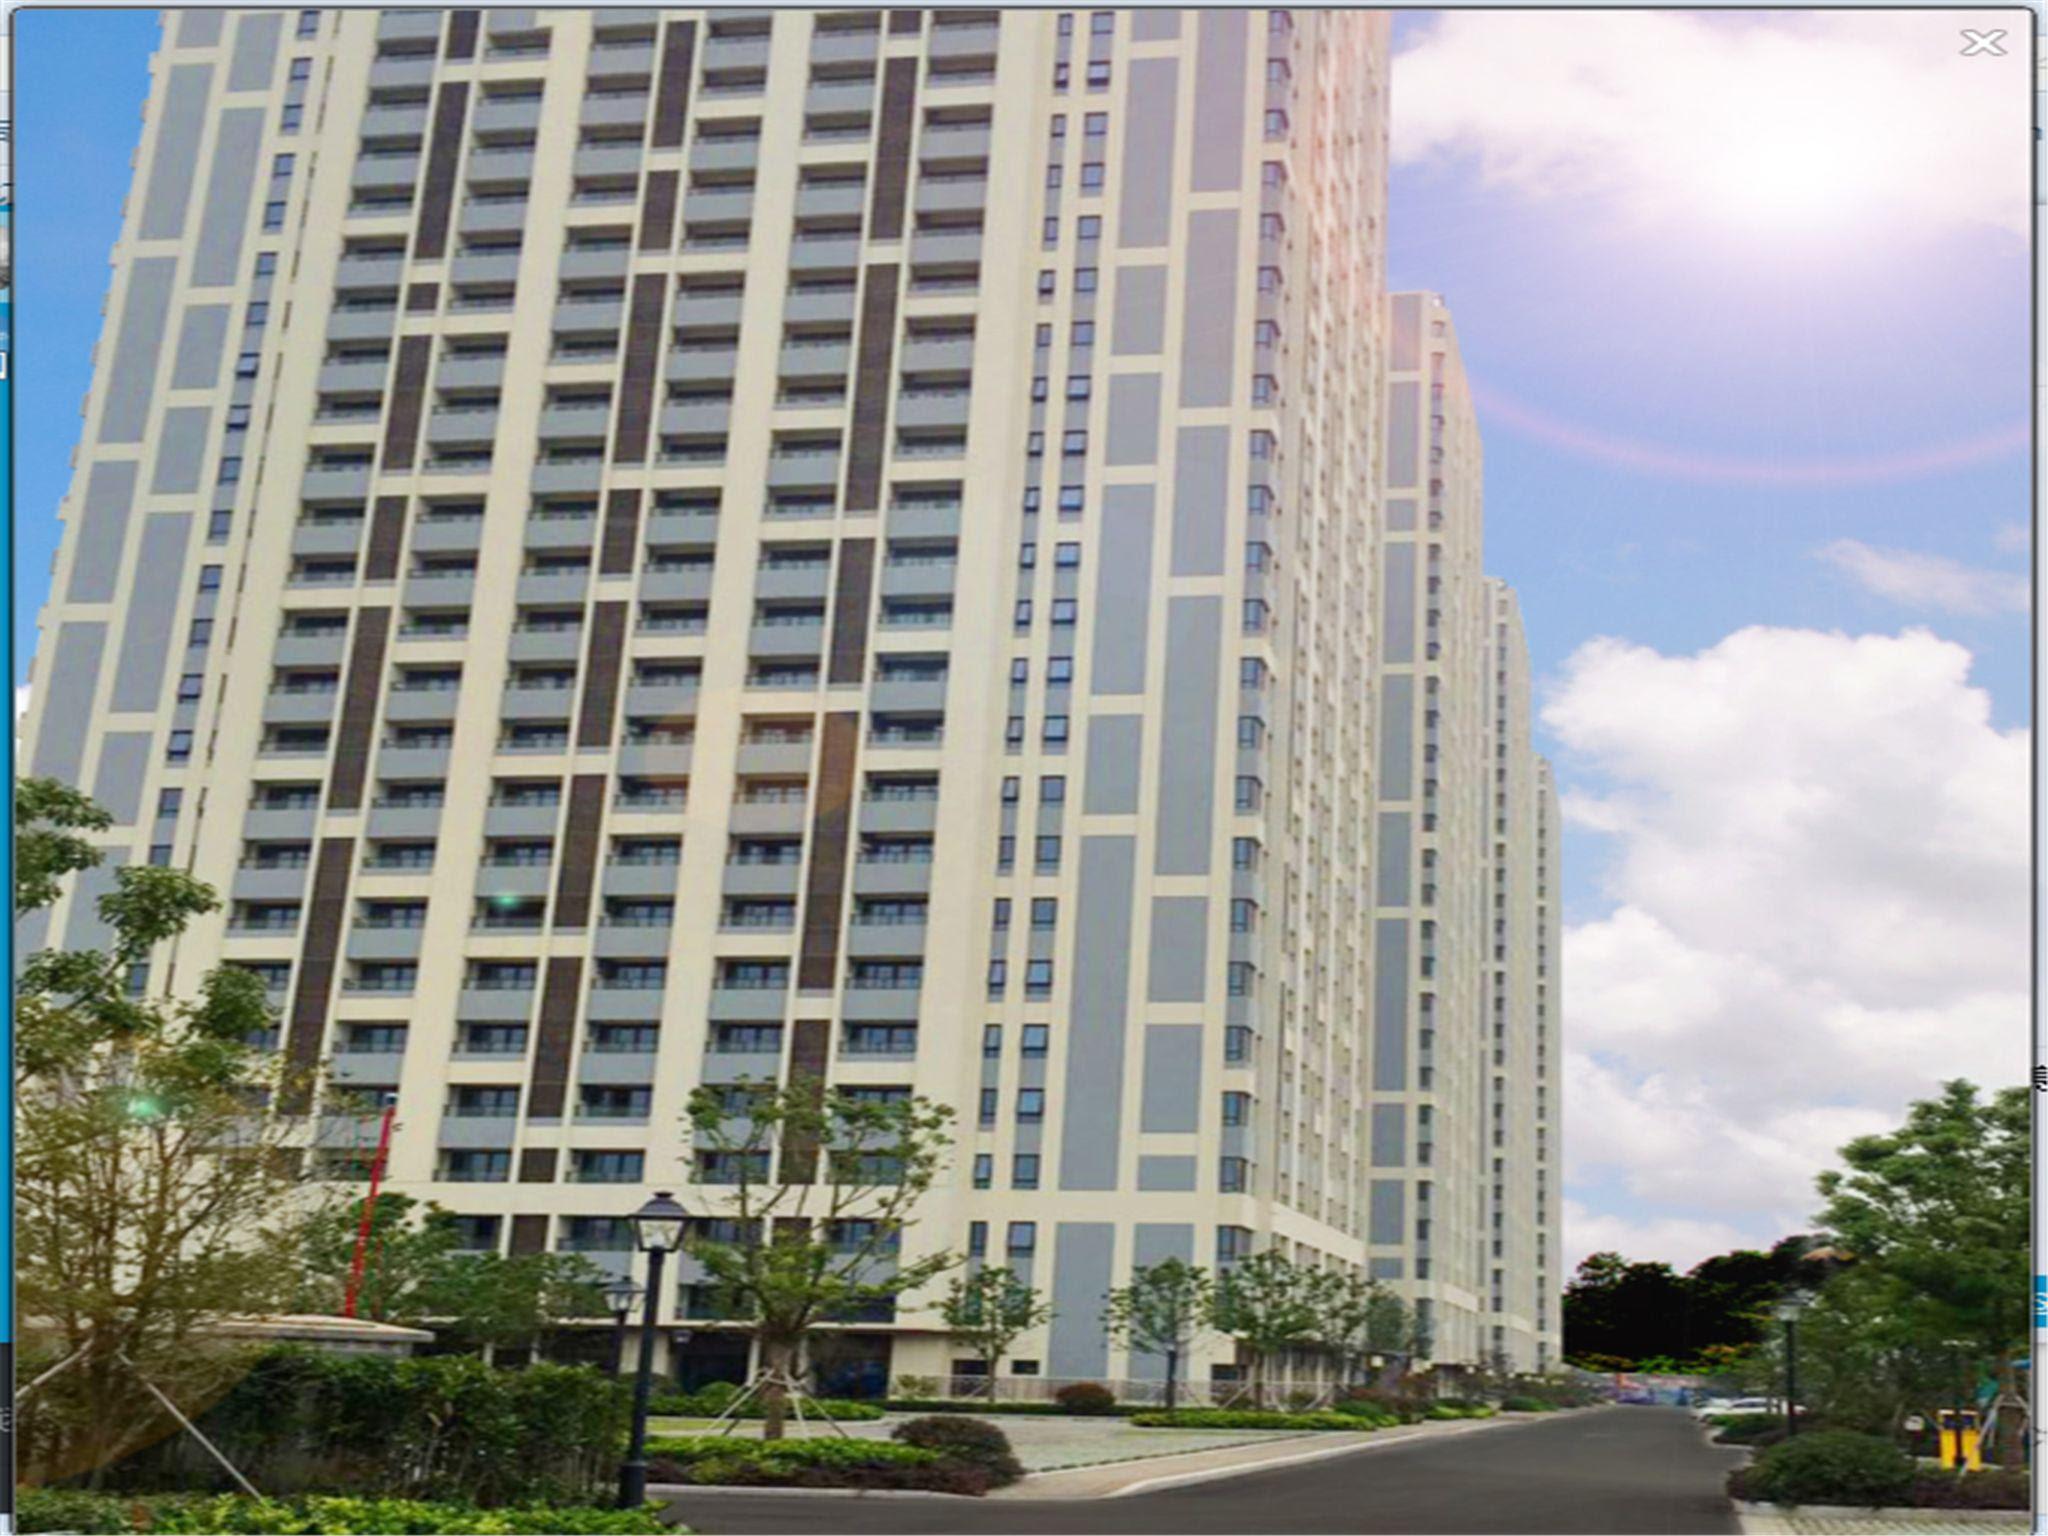 Bedom Apartments Wanda Taihu Yuexi Wuxi Reviews